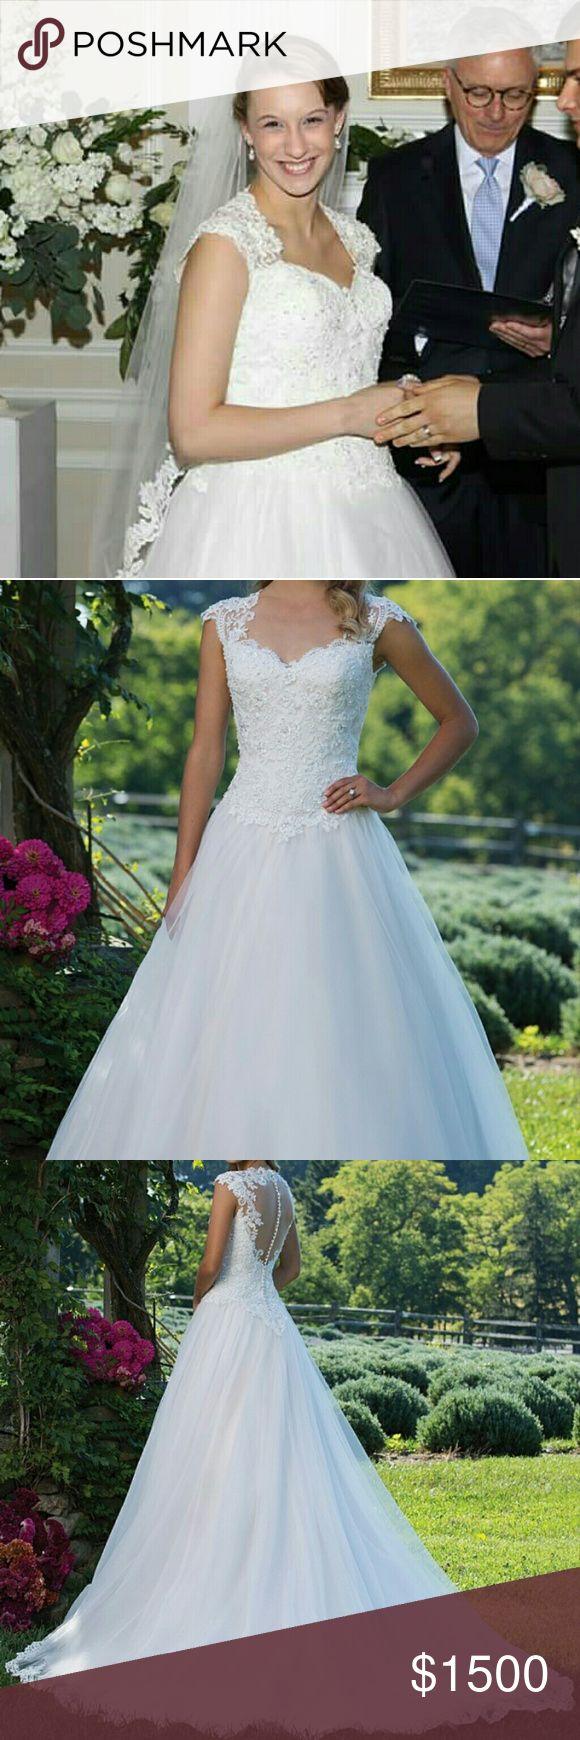 2 piece crop top wedding dress  Pin by Michael J Rivera on Fit u Gorgeous   Pinterest  Muscular